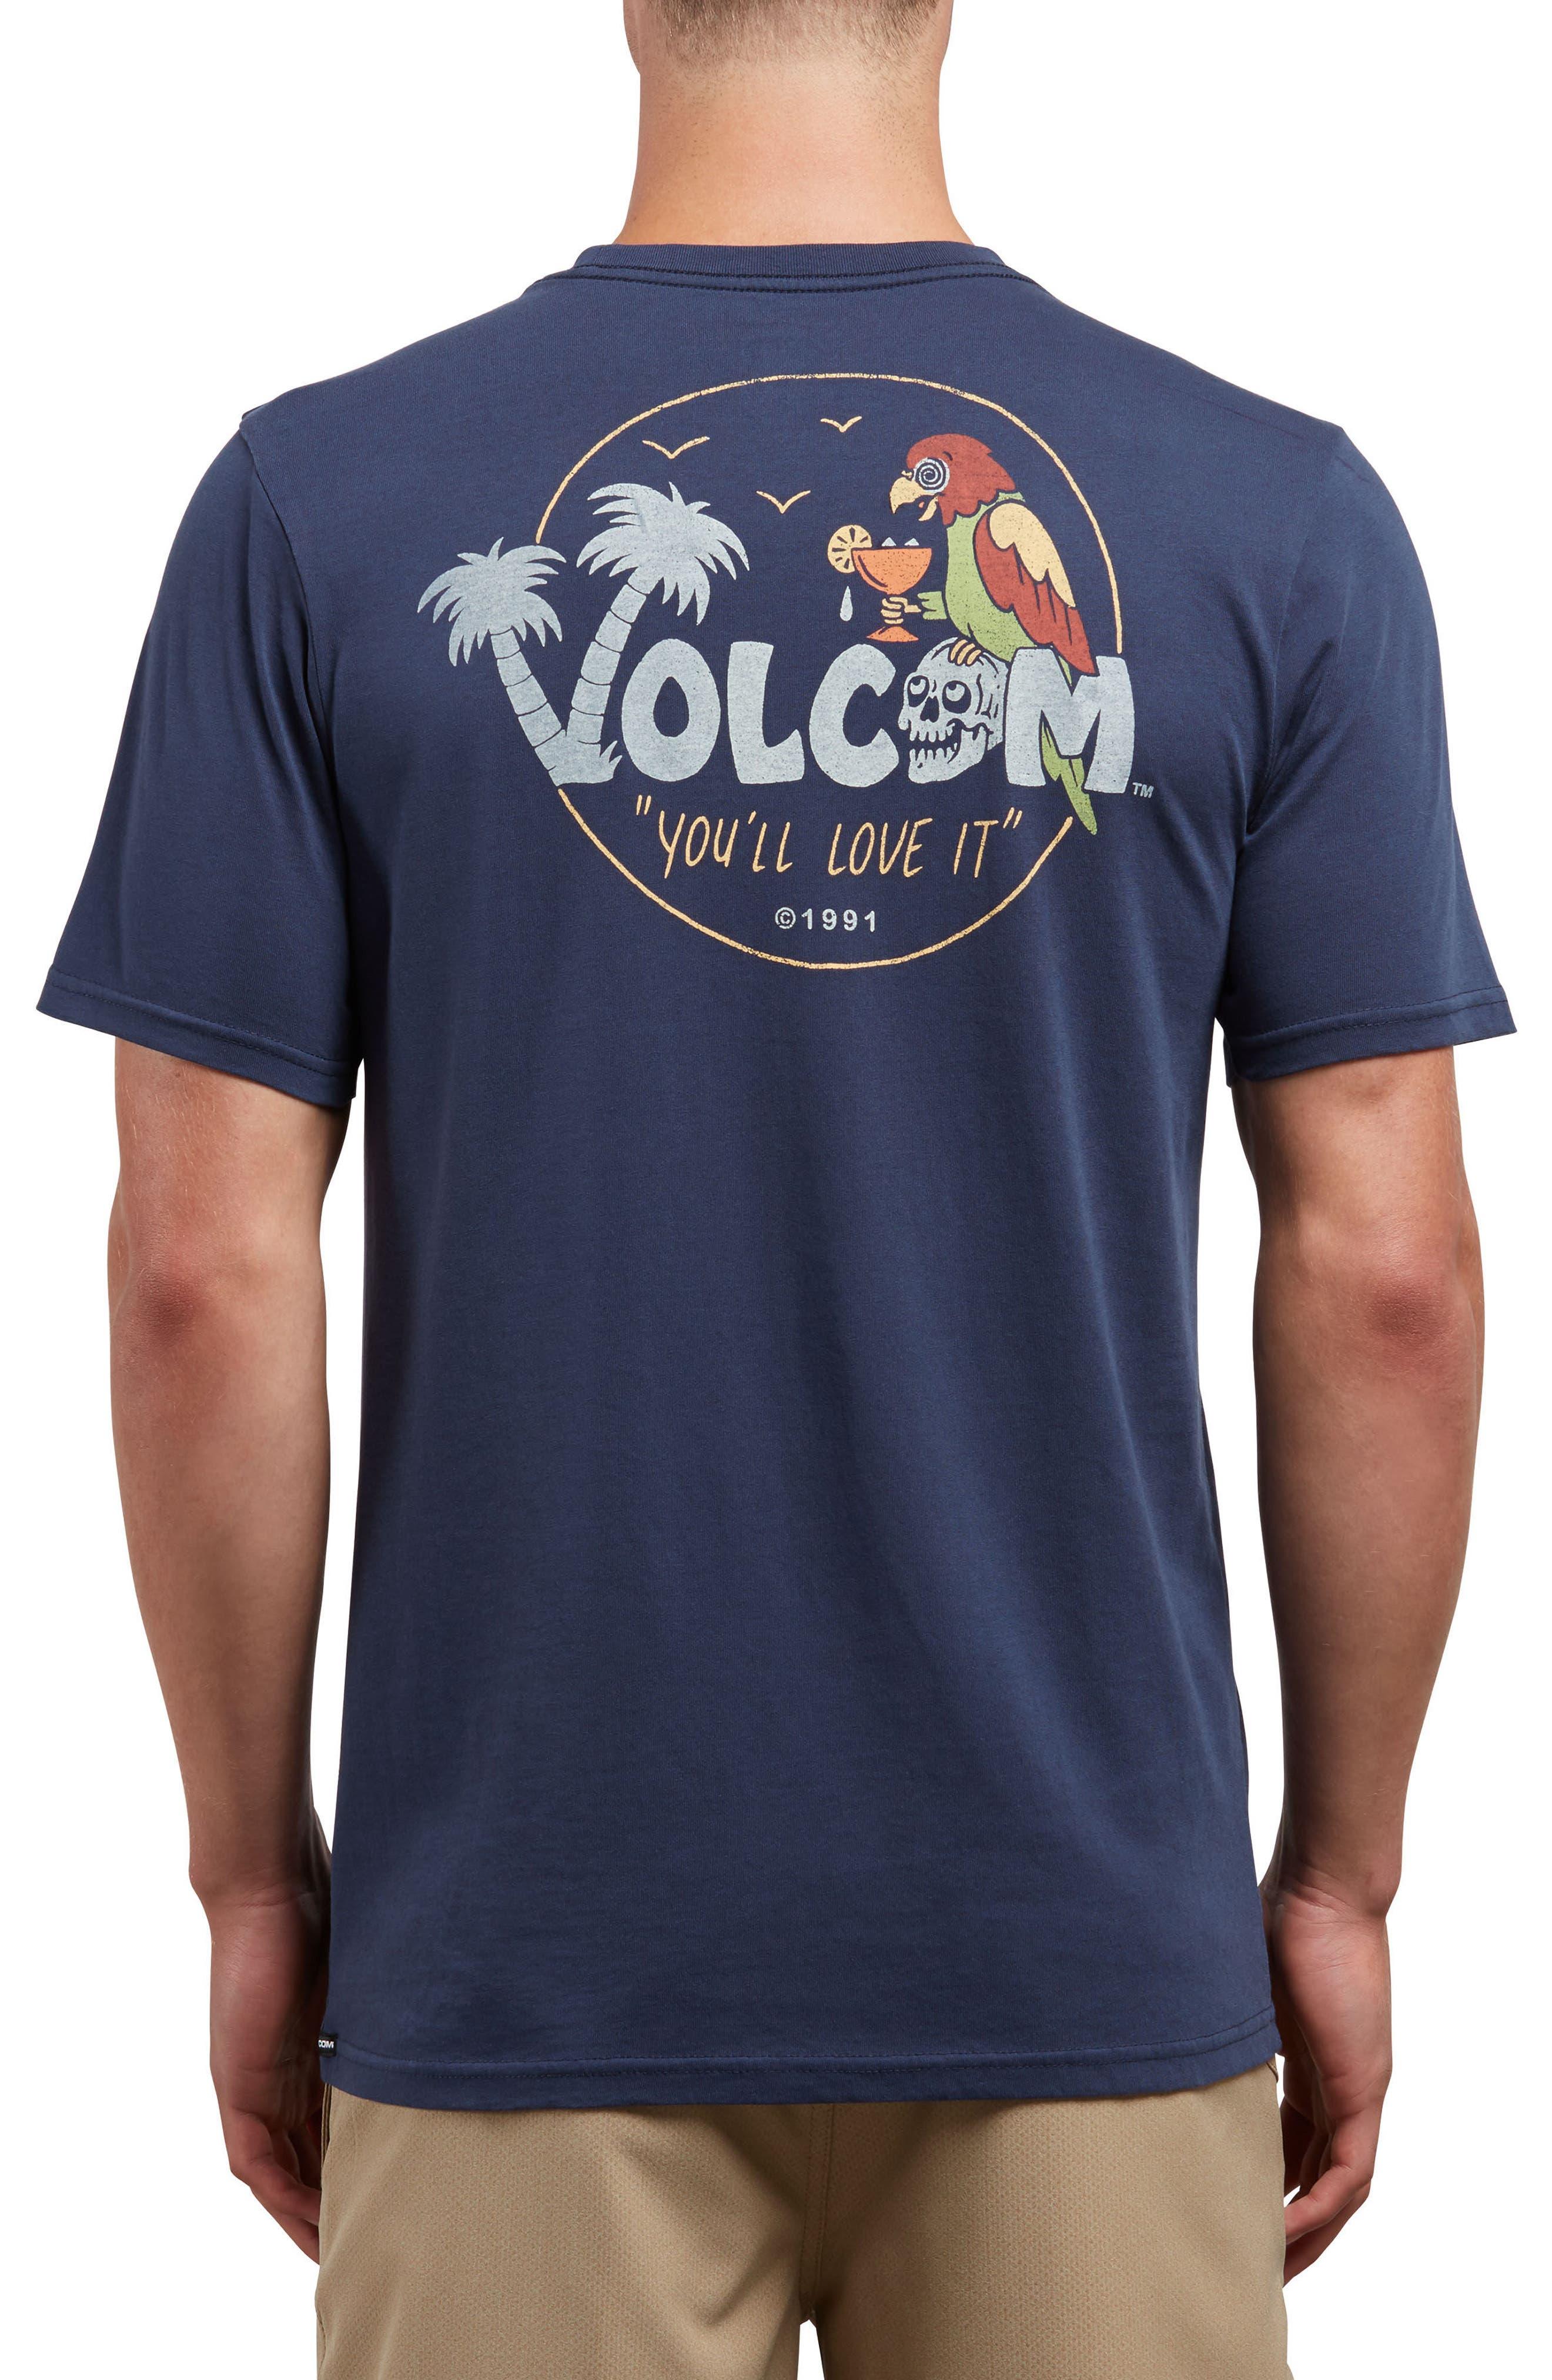 El Loro Loco T-Shirt,                             Alternate thumbnail 2, color,                             NAVY